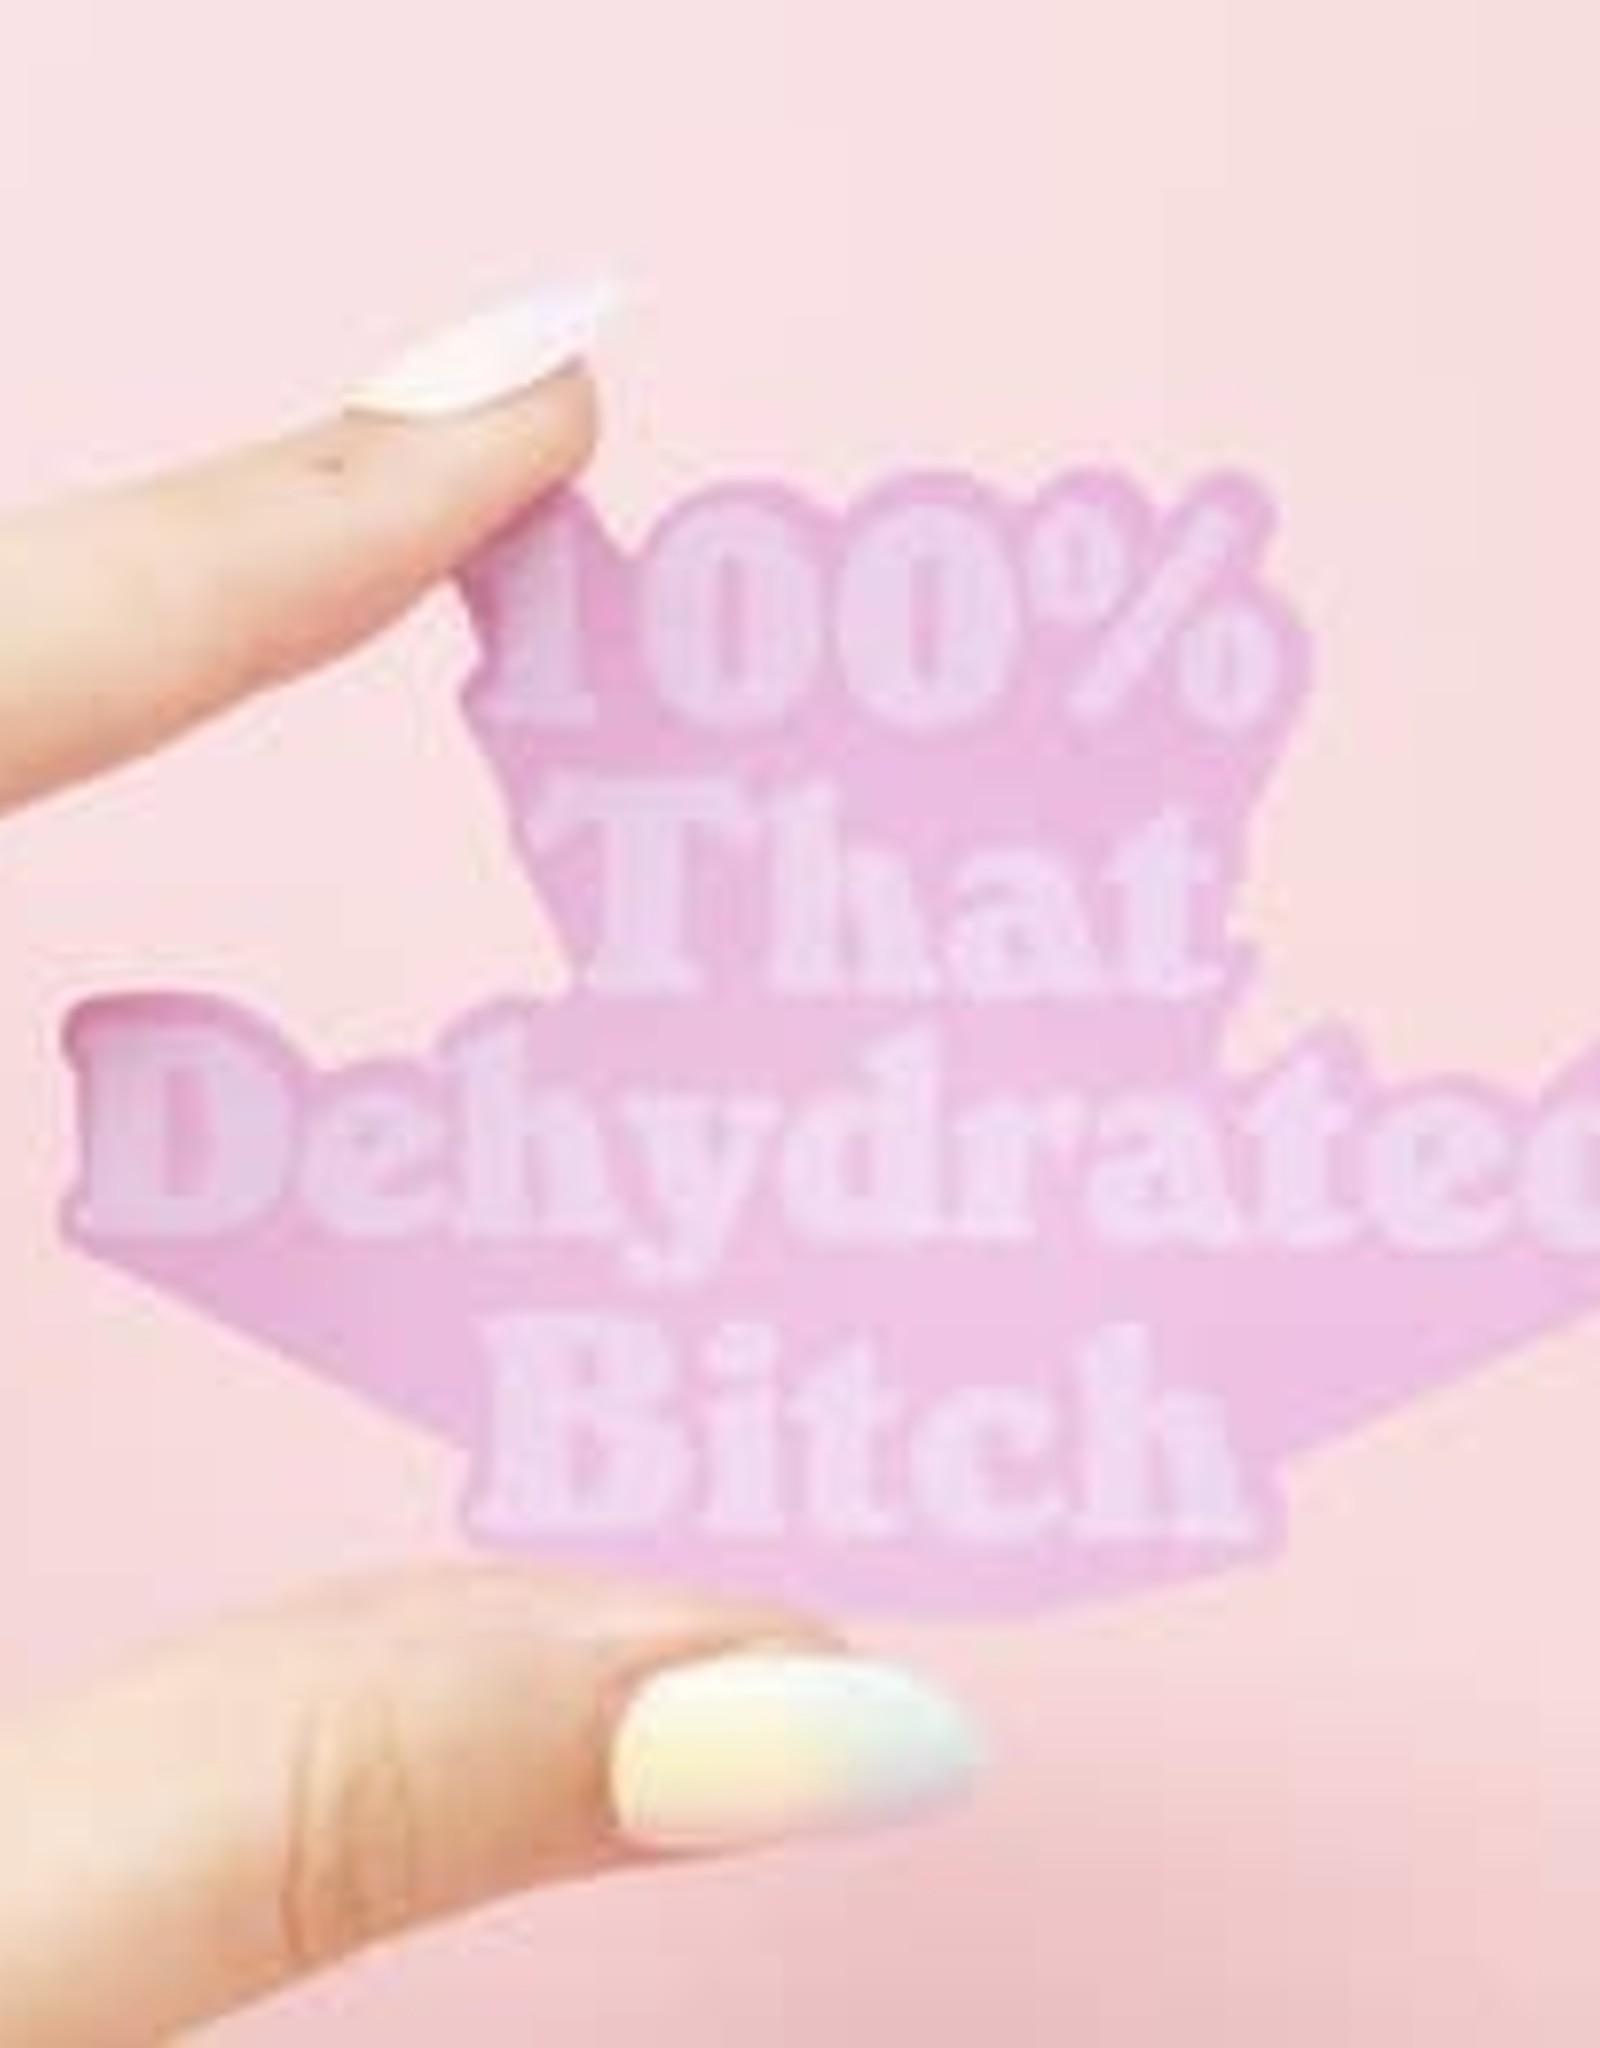 Made Au Gold Made Au Gold   100% That Dehydrated Bitch Sticker